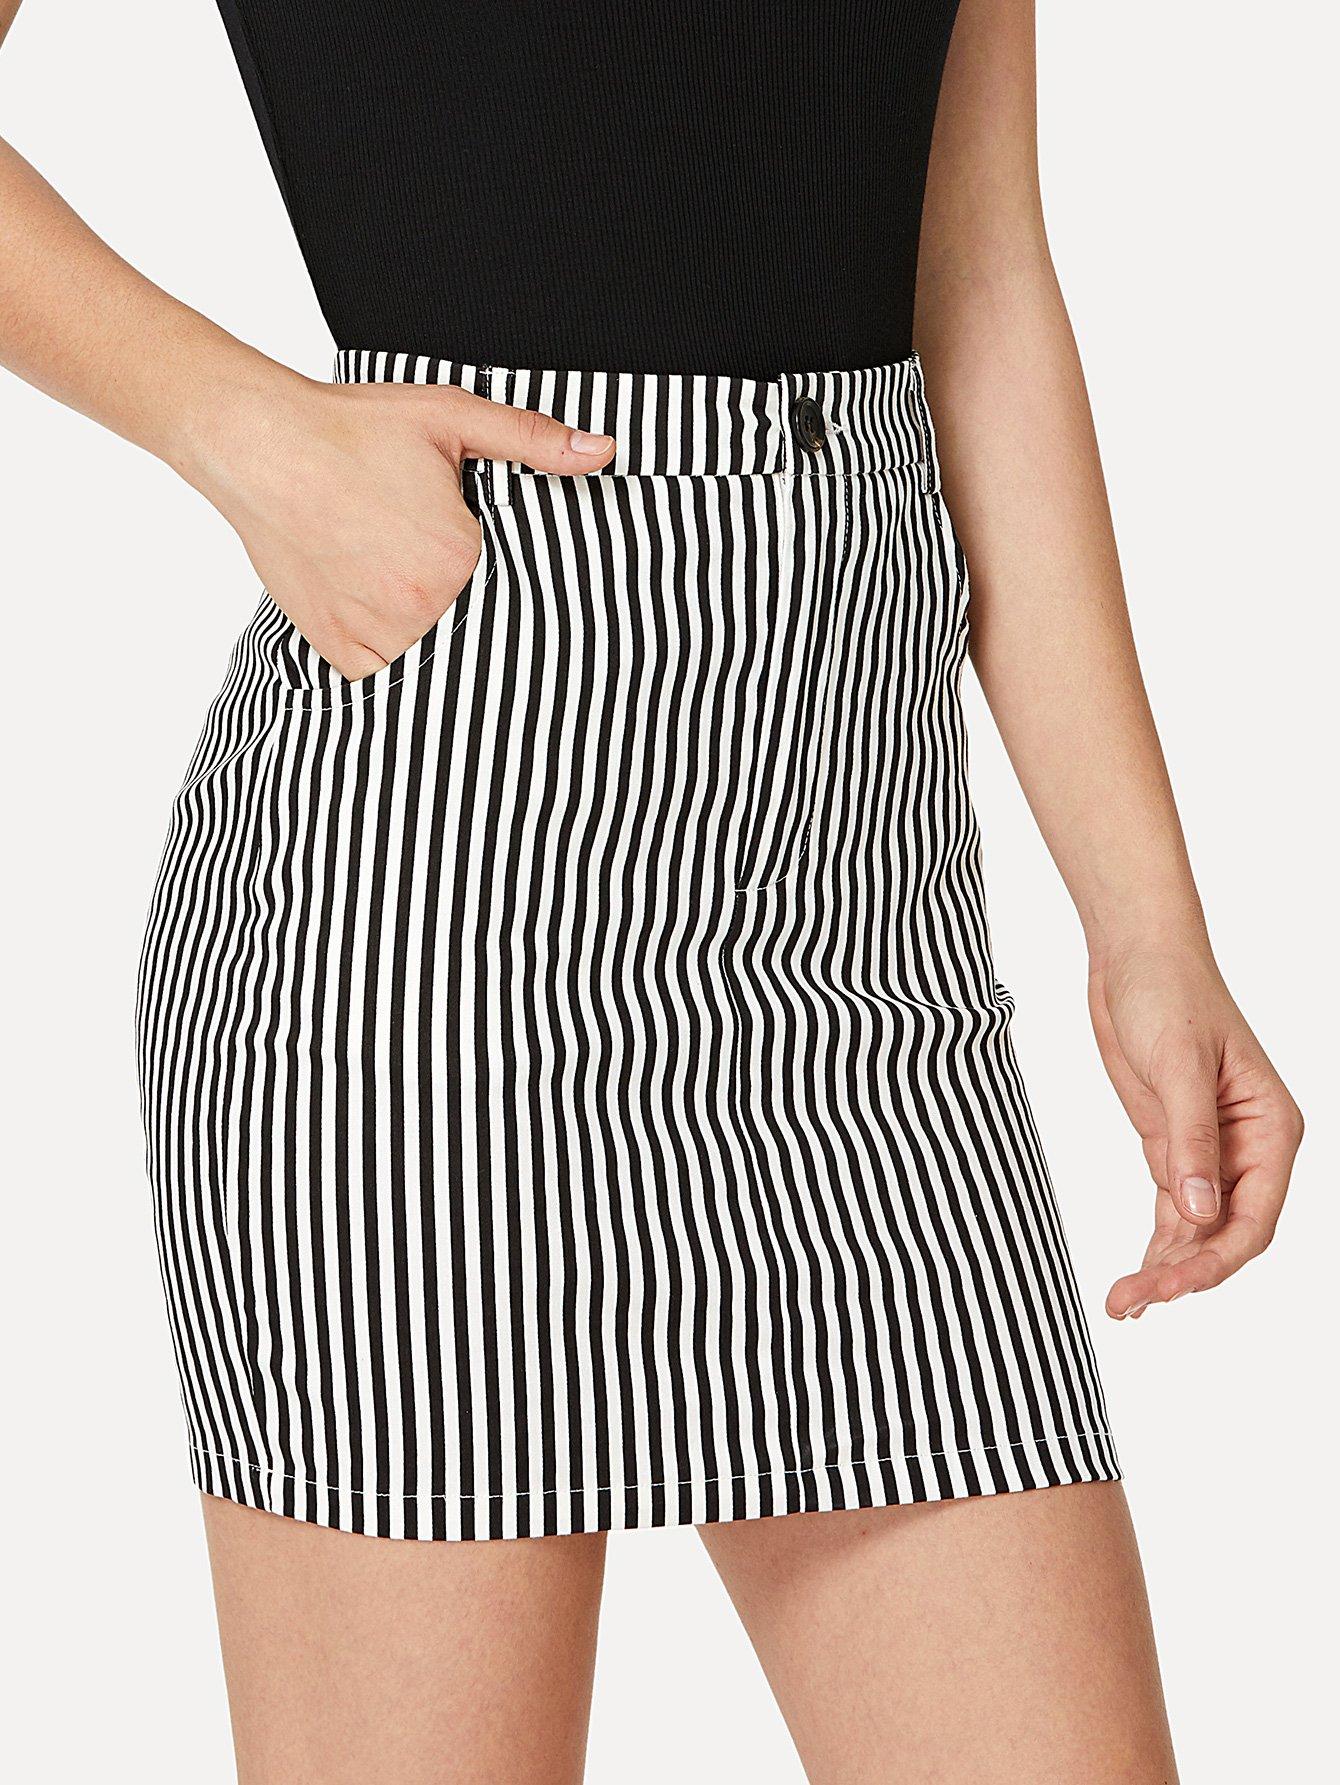 Zip Up Pinstripe Skirt